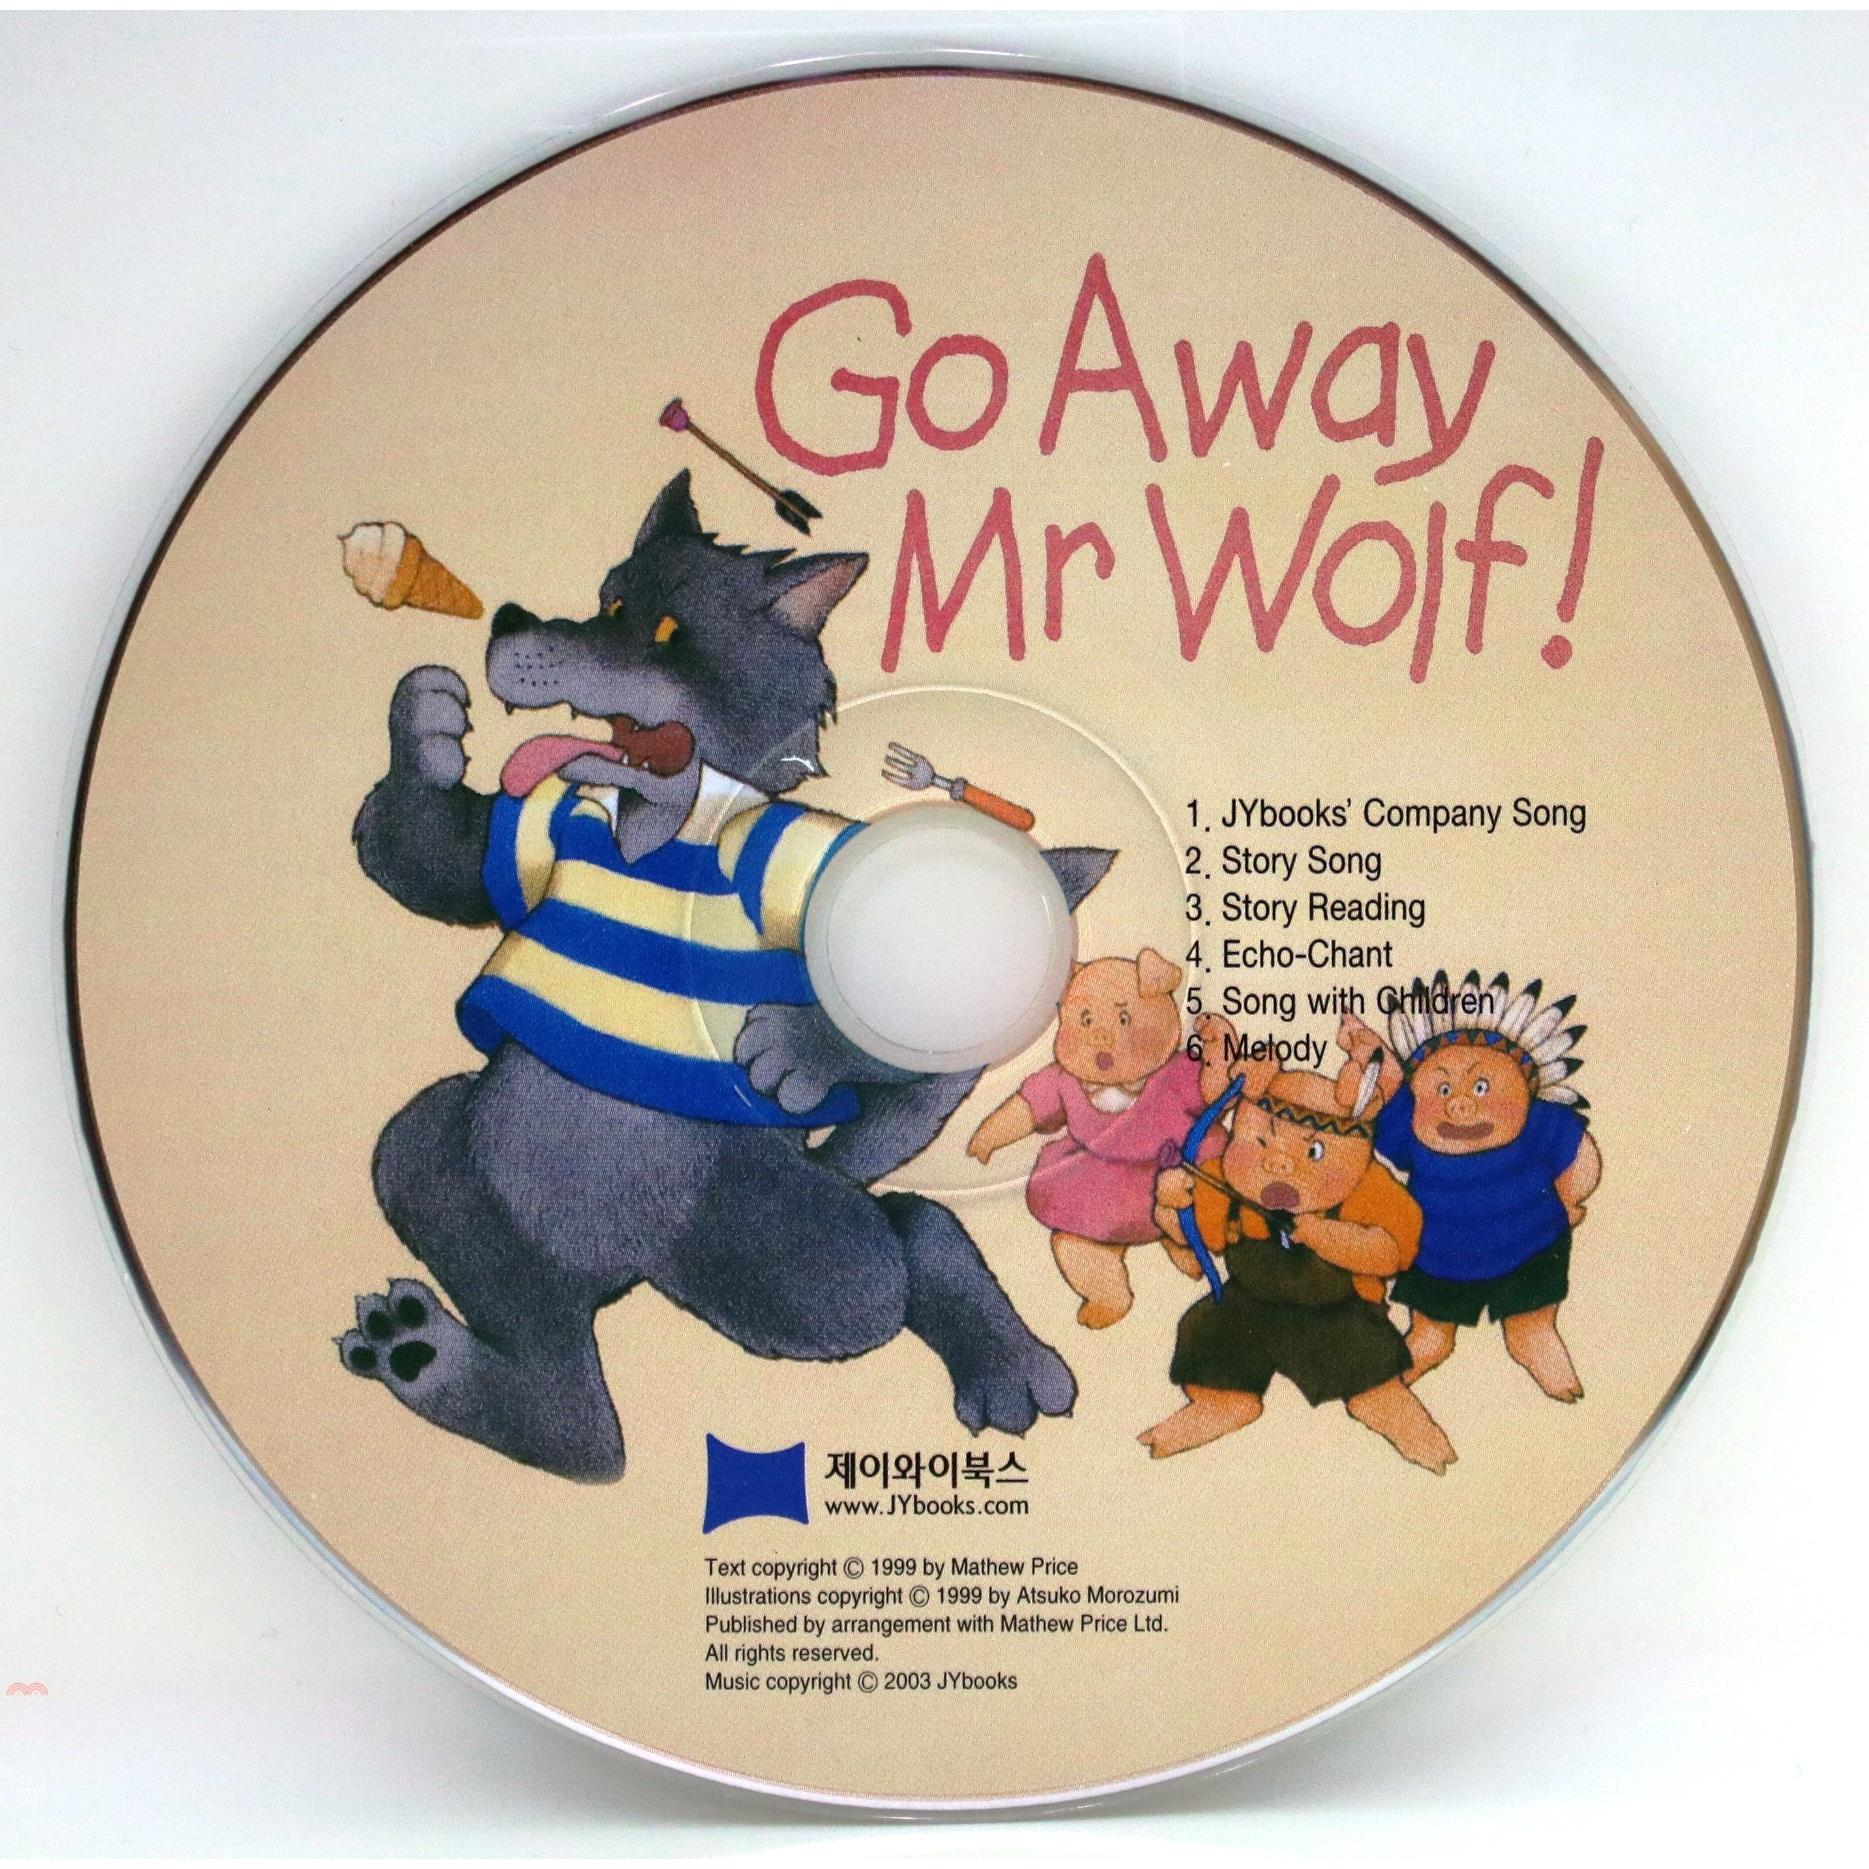 Go Away Mr Wolf (1 CD only) 廖彩杏老師推薦有聲書第2週【三民網路書店】[79折]